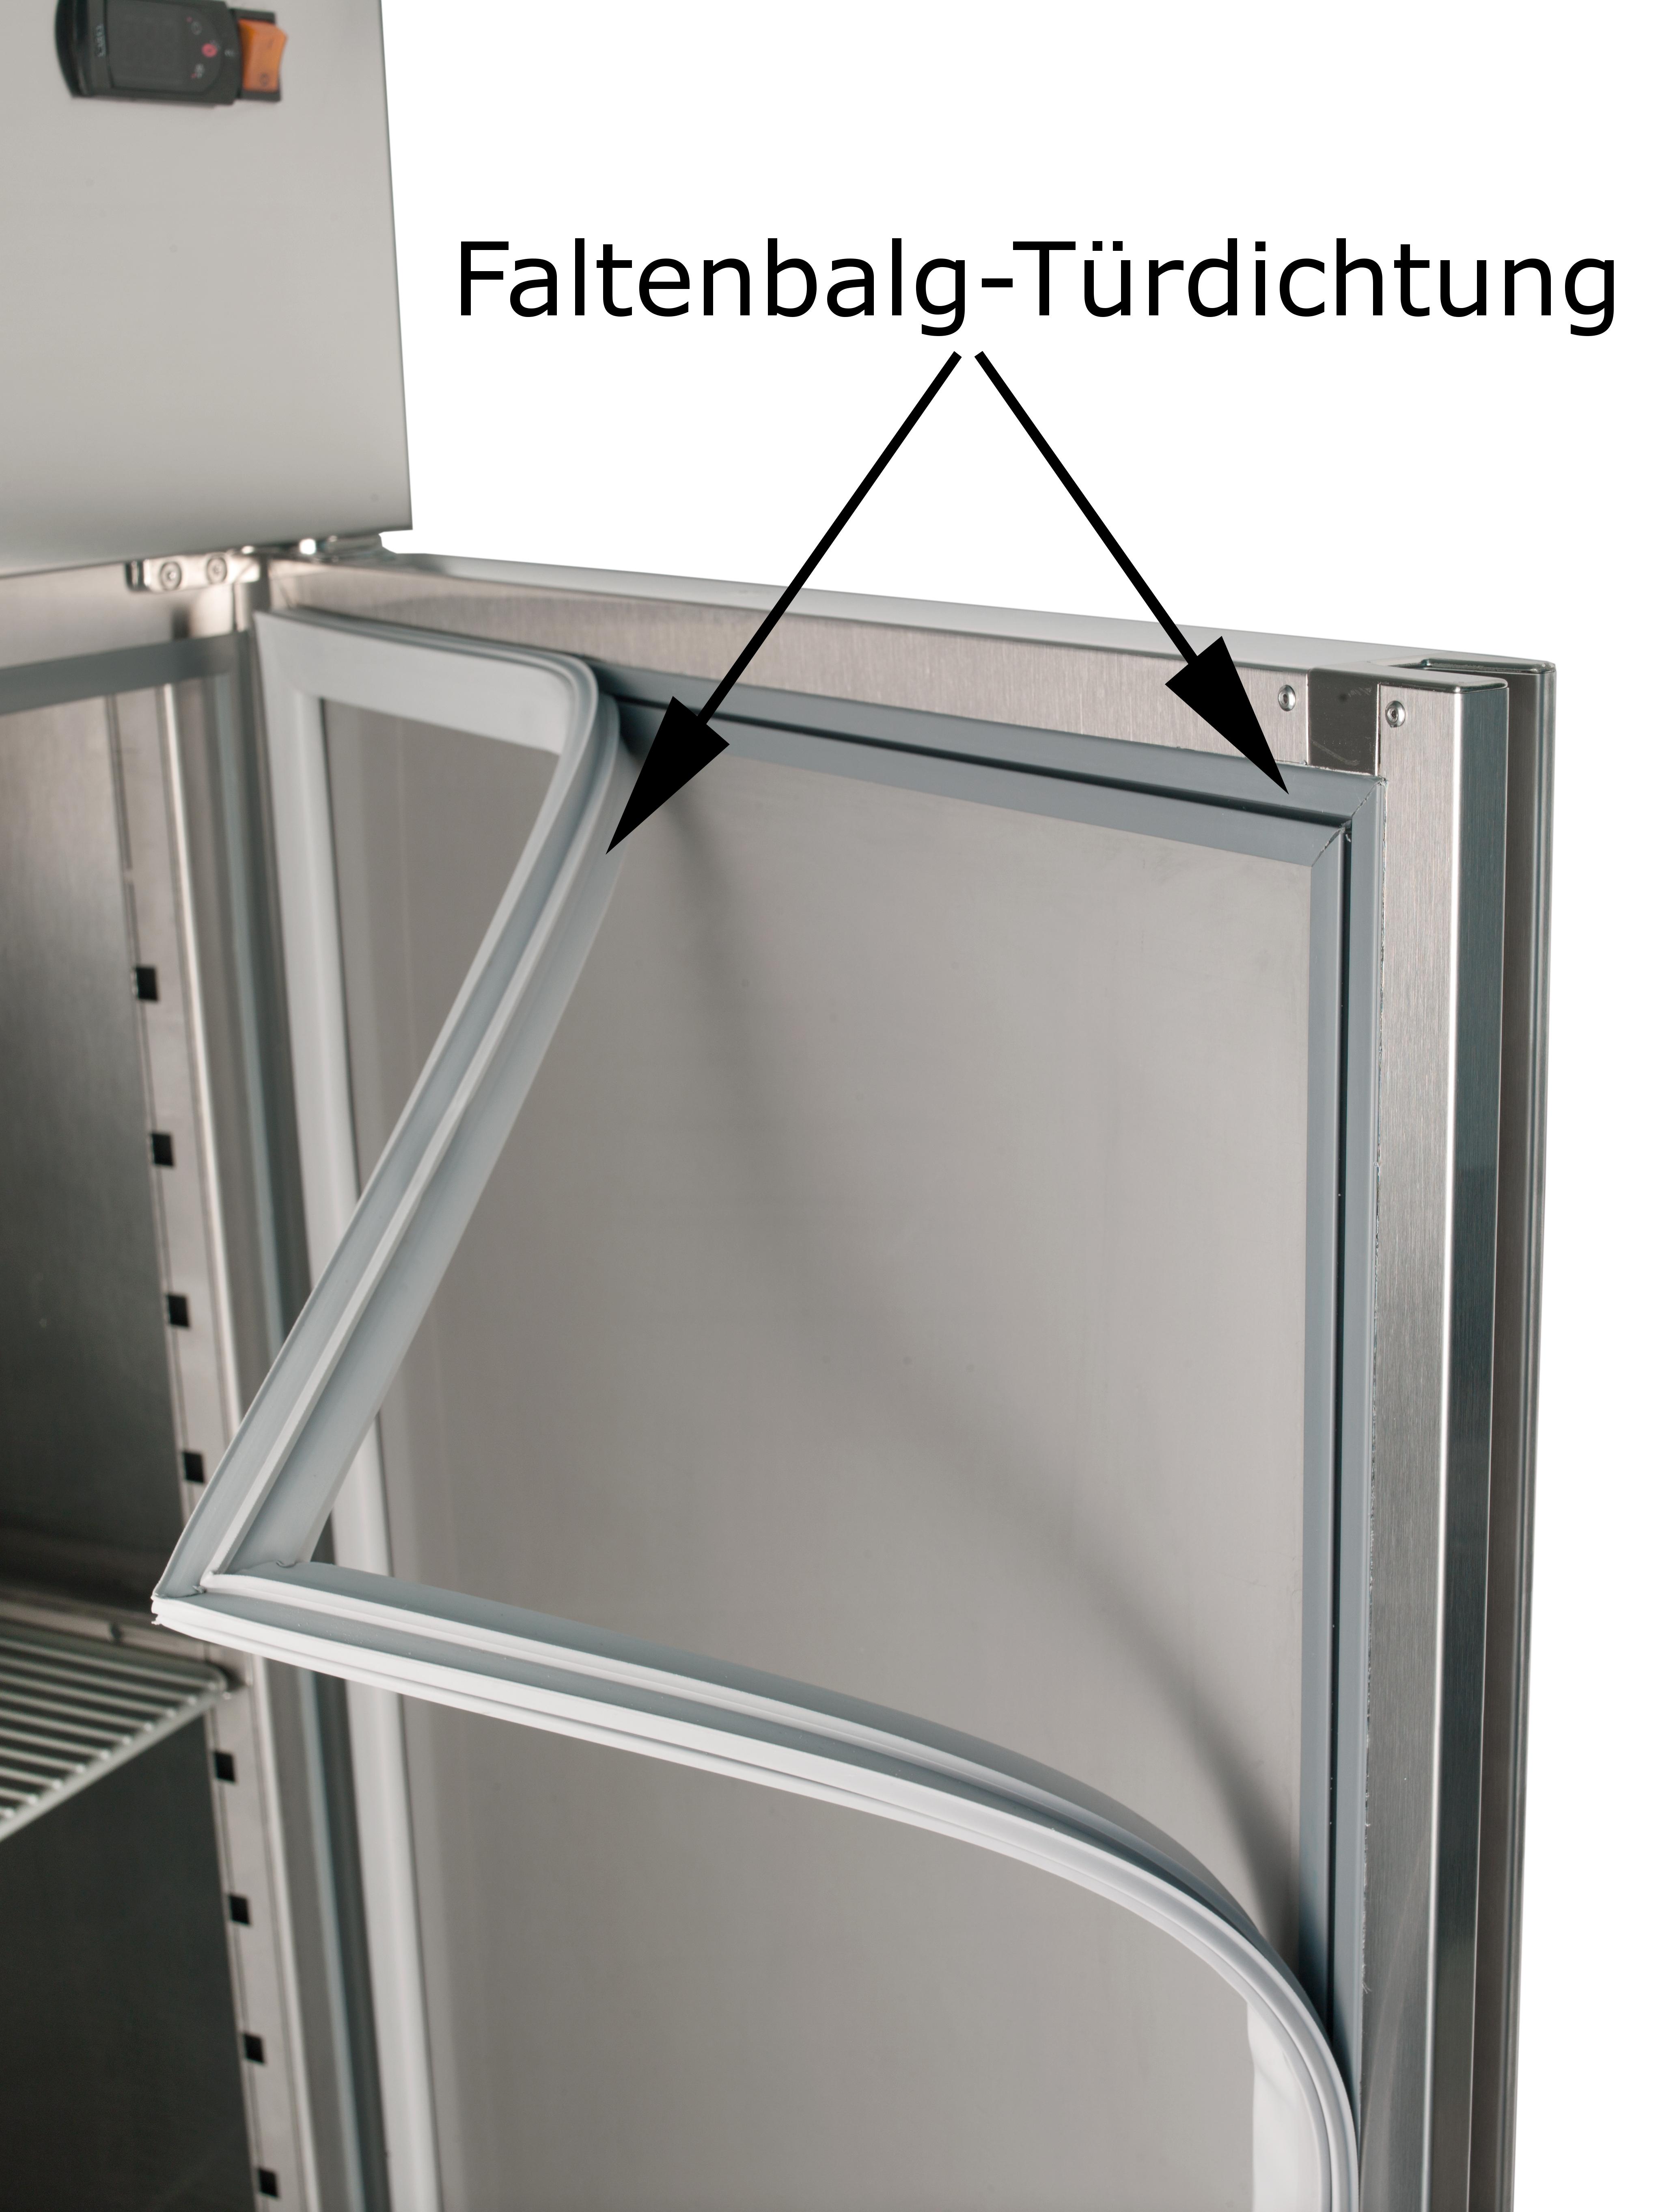 Bäckereitiefkühlschrank Profi 1400 EN mit 2 Türen line Shop